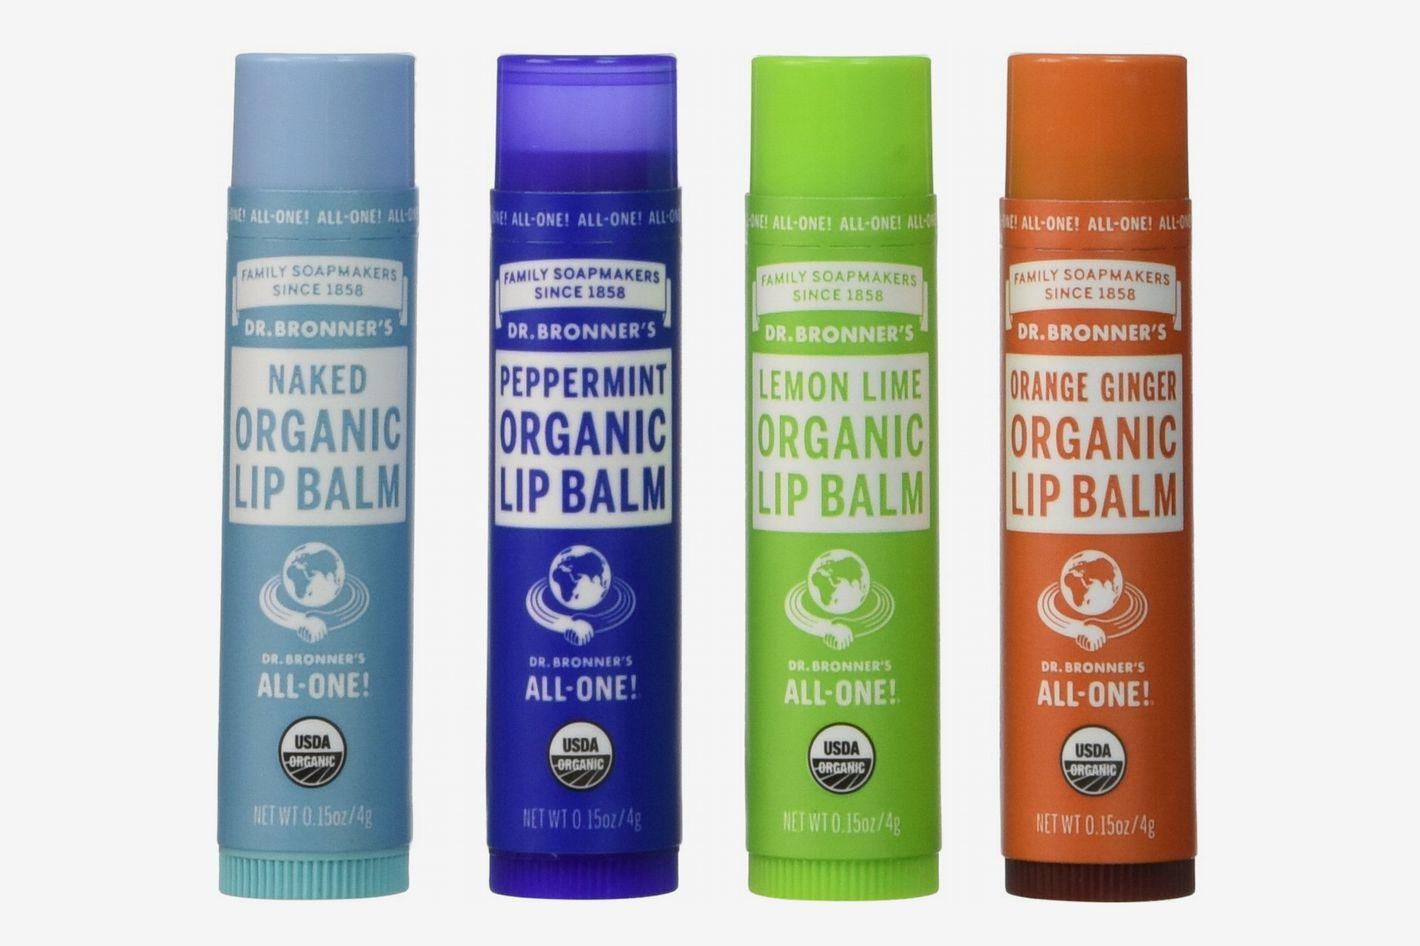 Dr. Bronner's Organic Lip Balm, Pack of 4